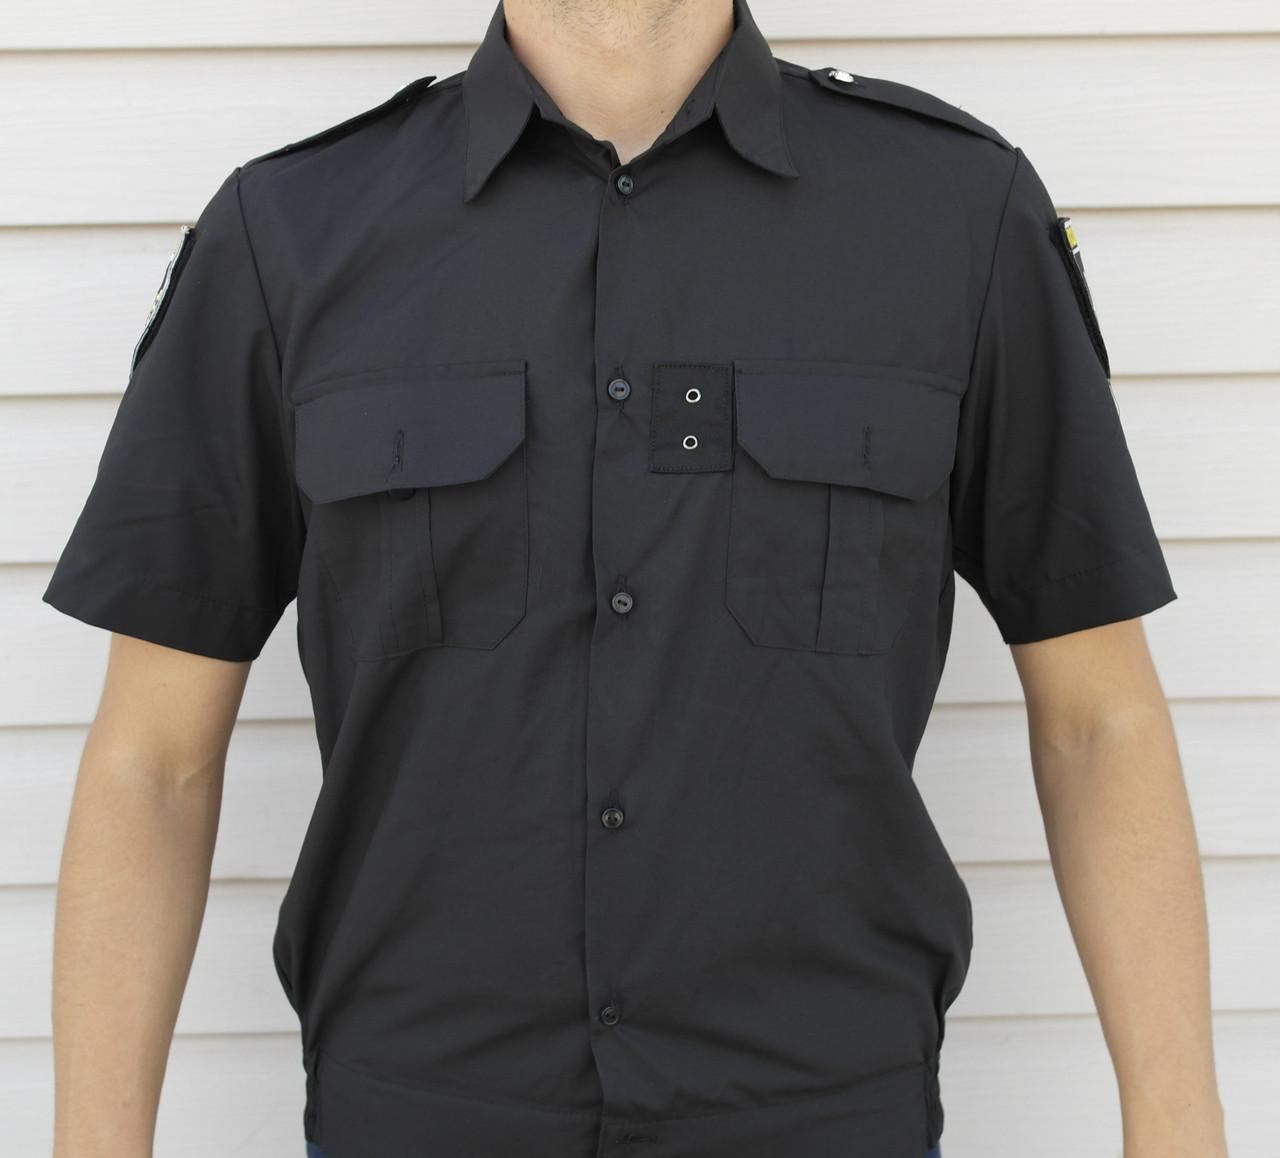 682d84a512c Форменная рубашка для полиции короткий рукав